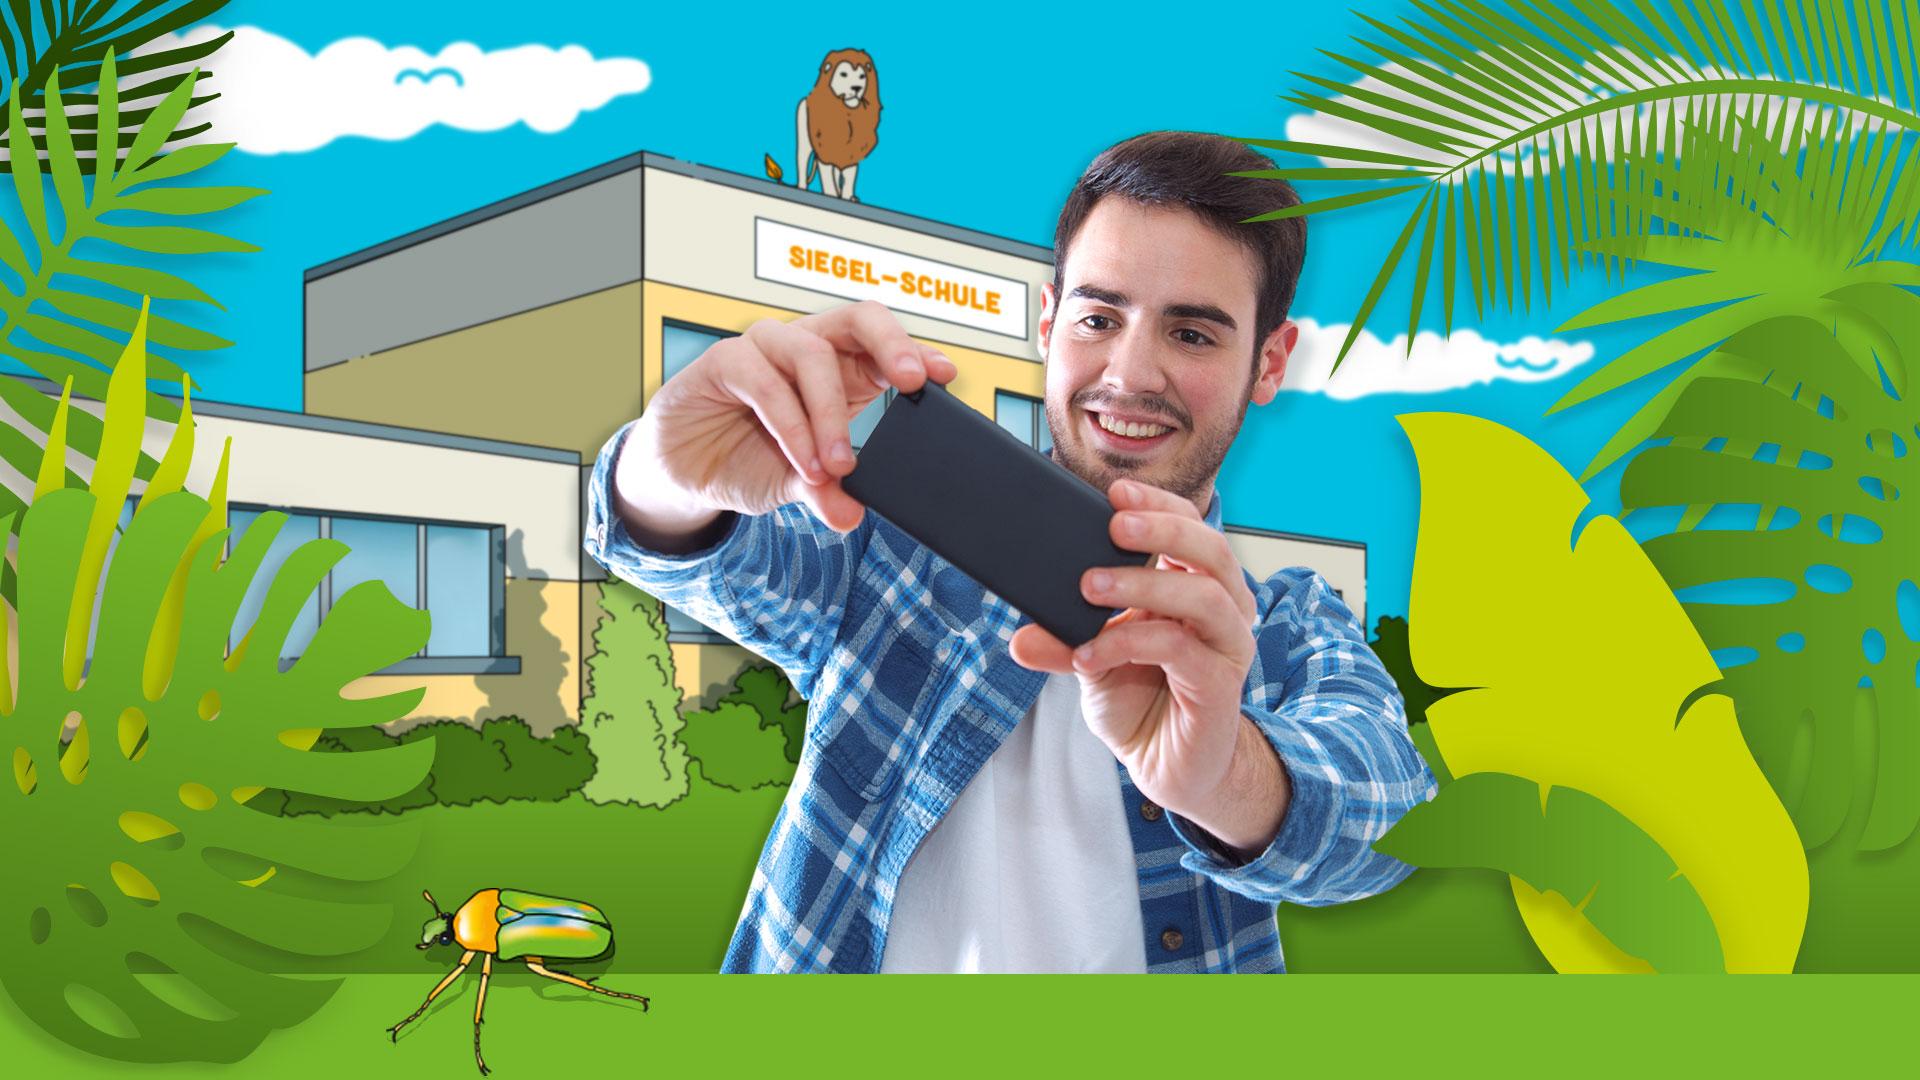 Smart-Film-Safari-Smartphone-Junge-Schule